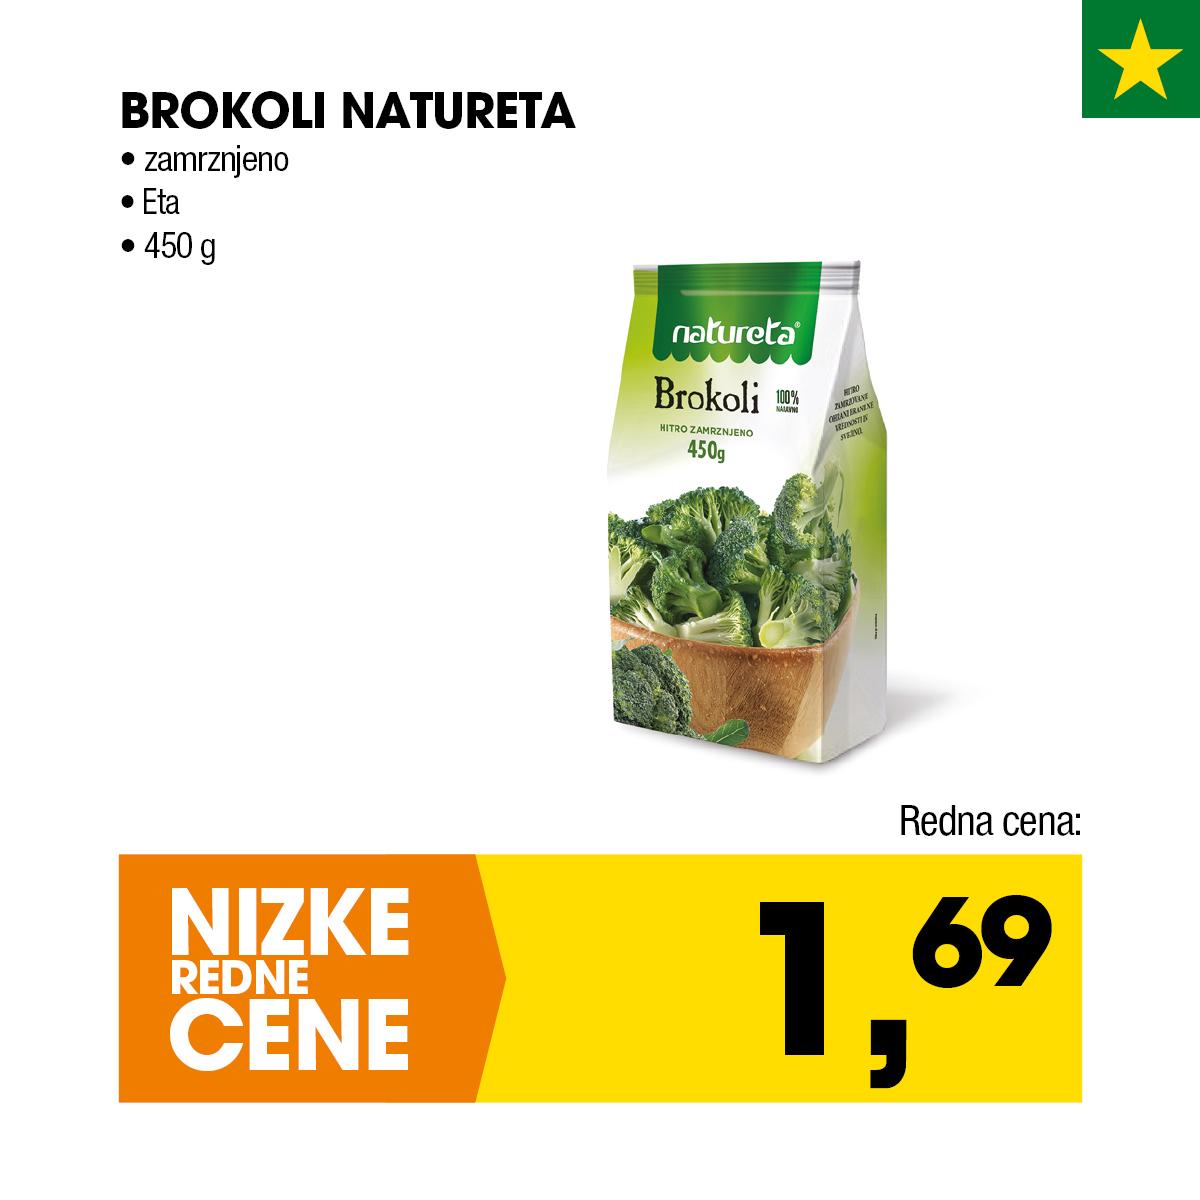 Nizke cene - Brokoli Natureta